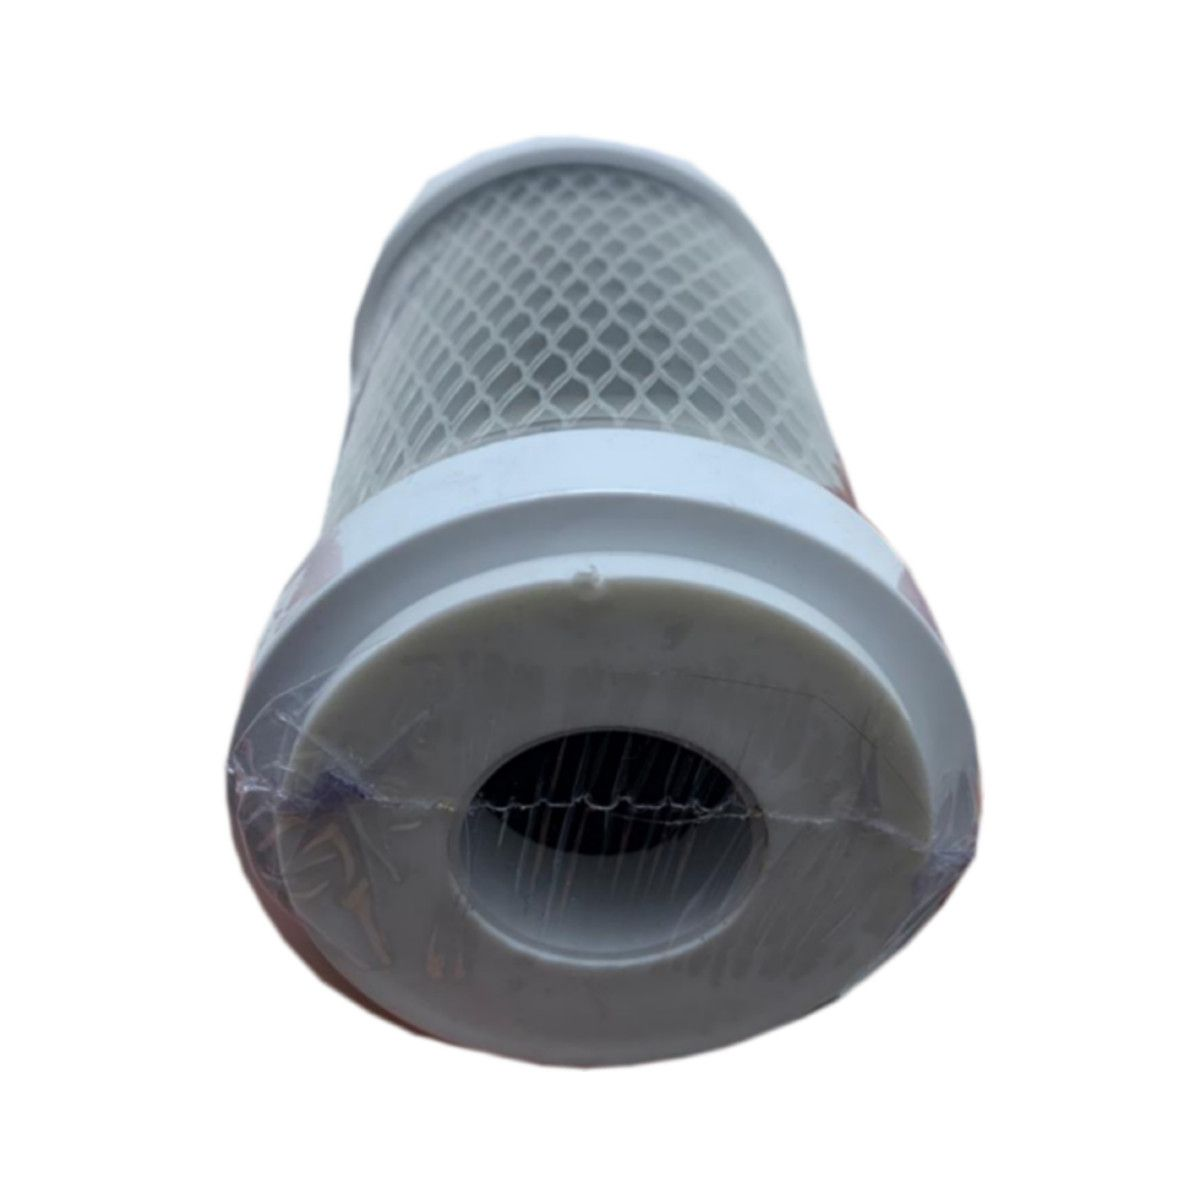 Refil Vela Filtro Pou 9 Eco Prima Carbon Block 9